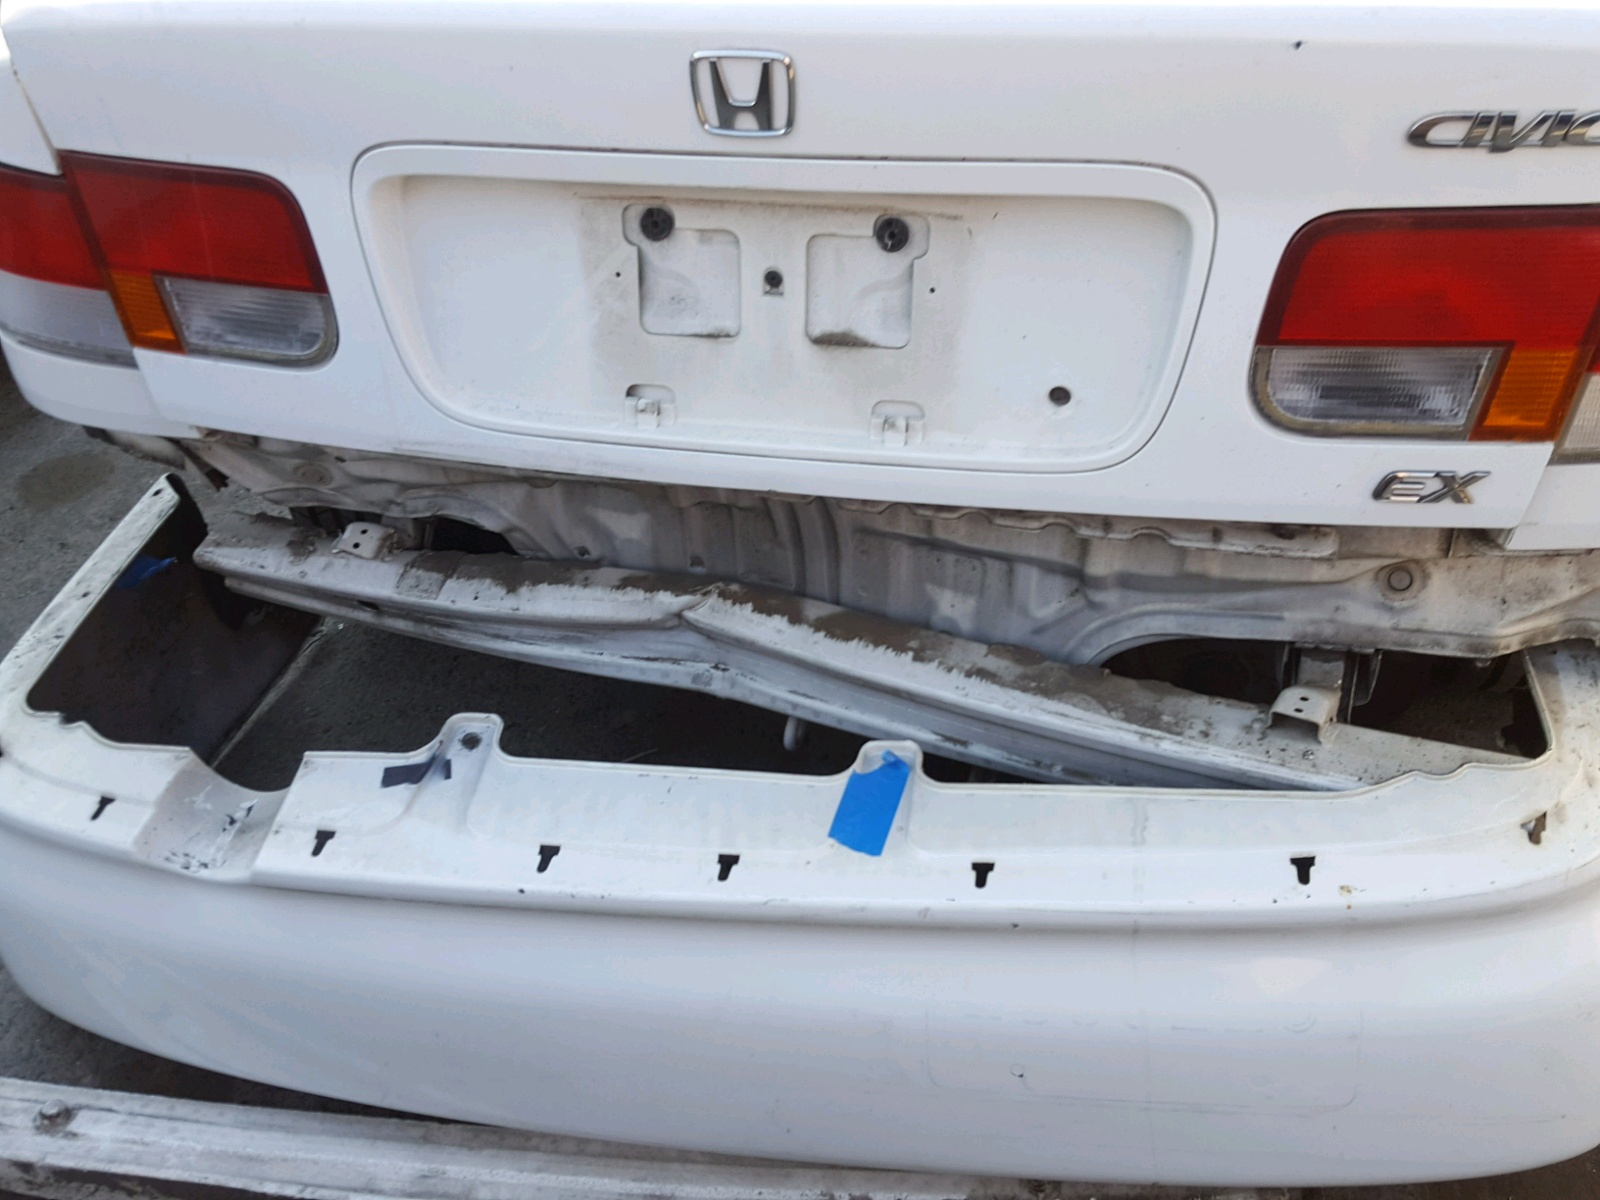 1999 Honda Civic Ex For Sale At Copart Martinez Ca Lot 51200508